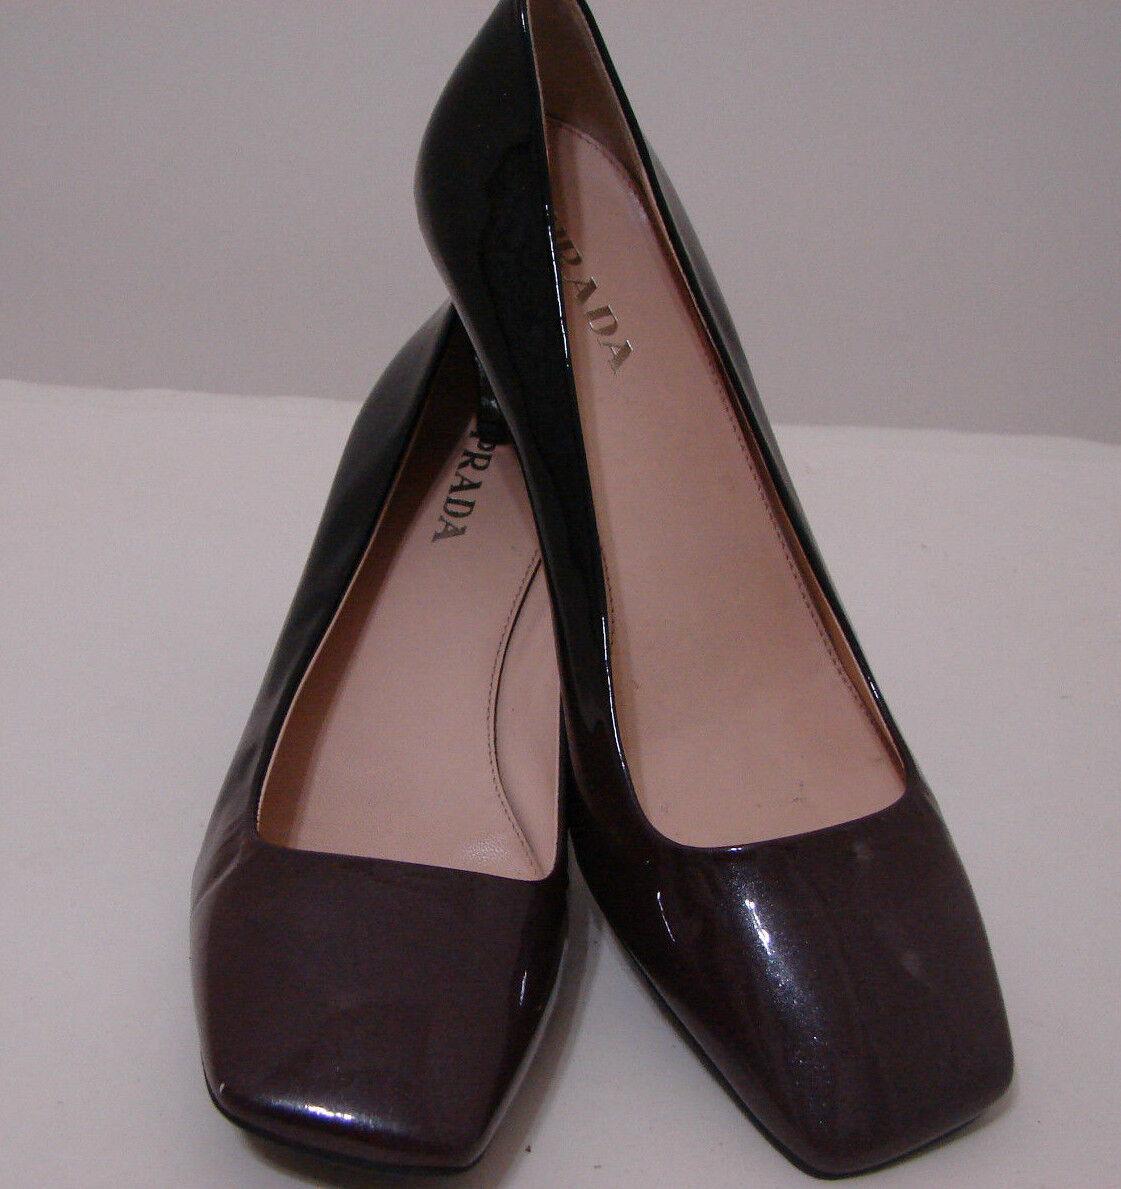 PRADA Vintage Black Brown Ombre Patent Leather Pumps NWD 39.5